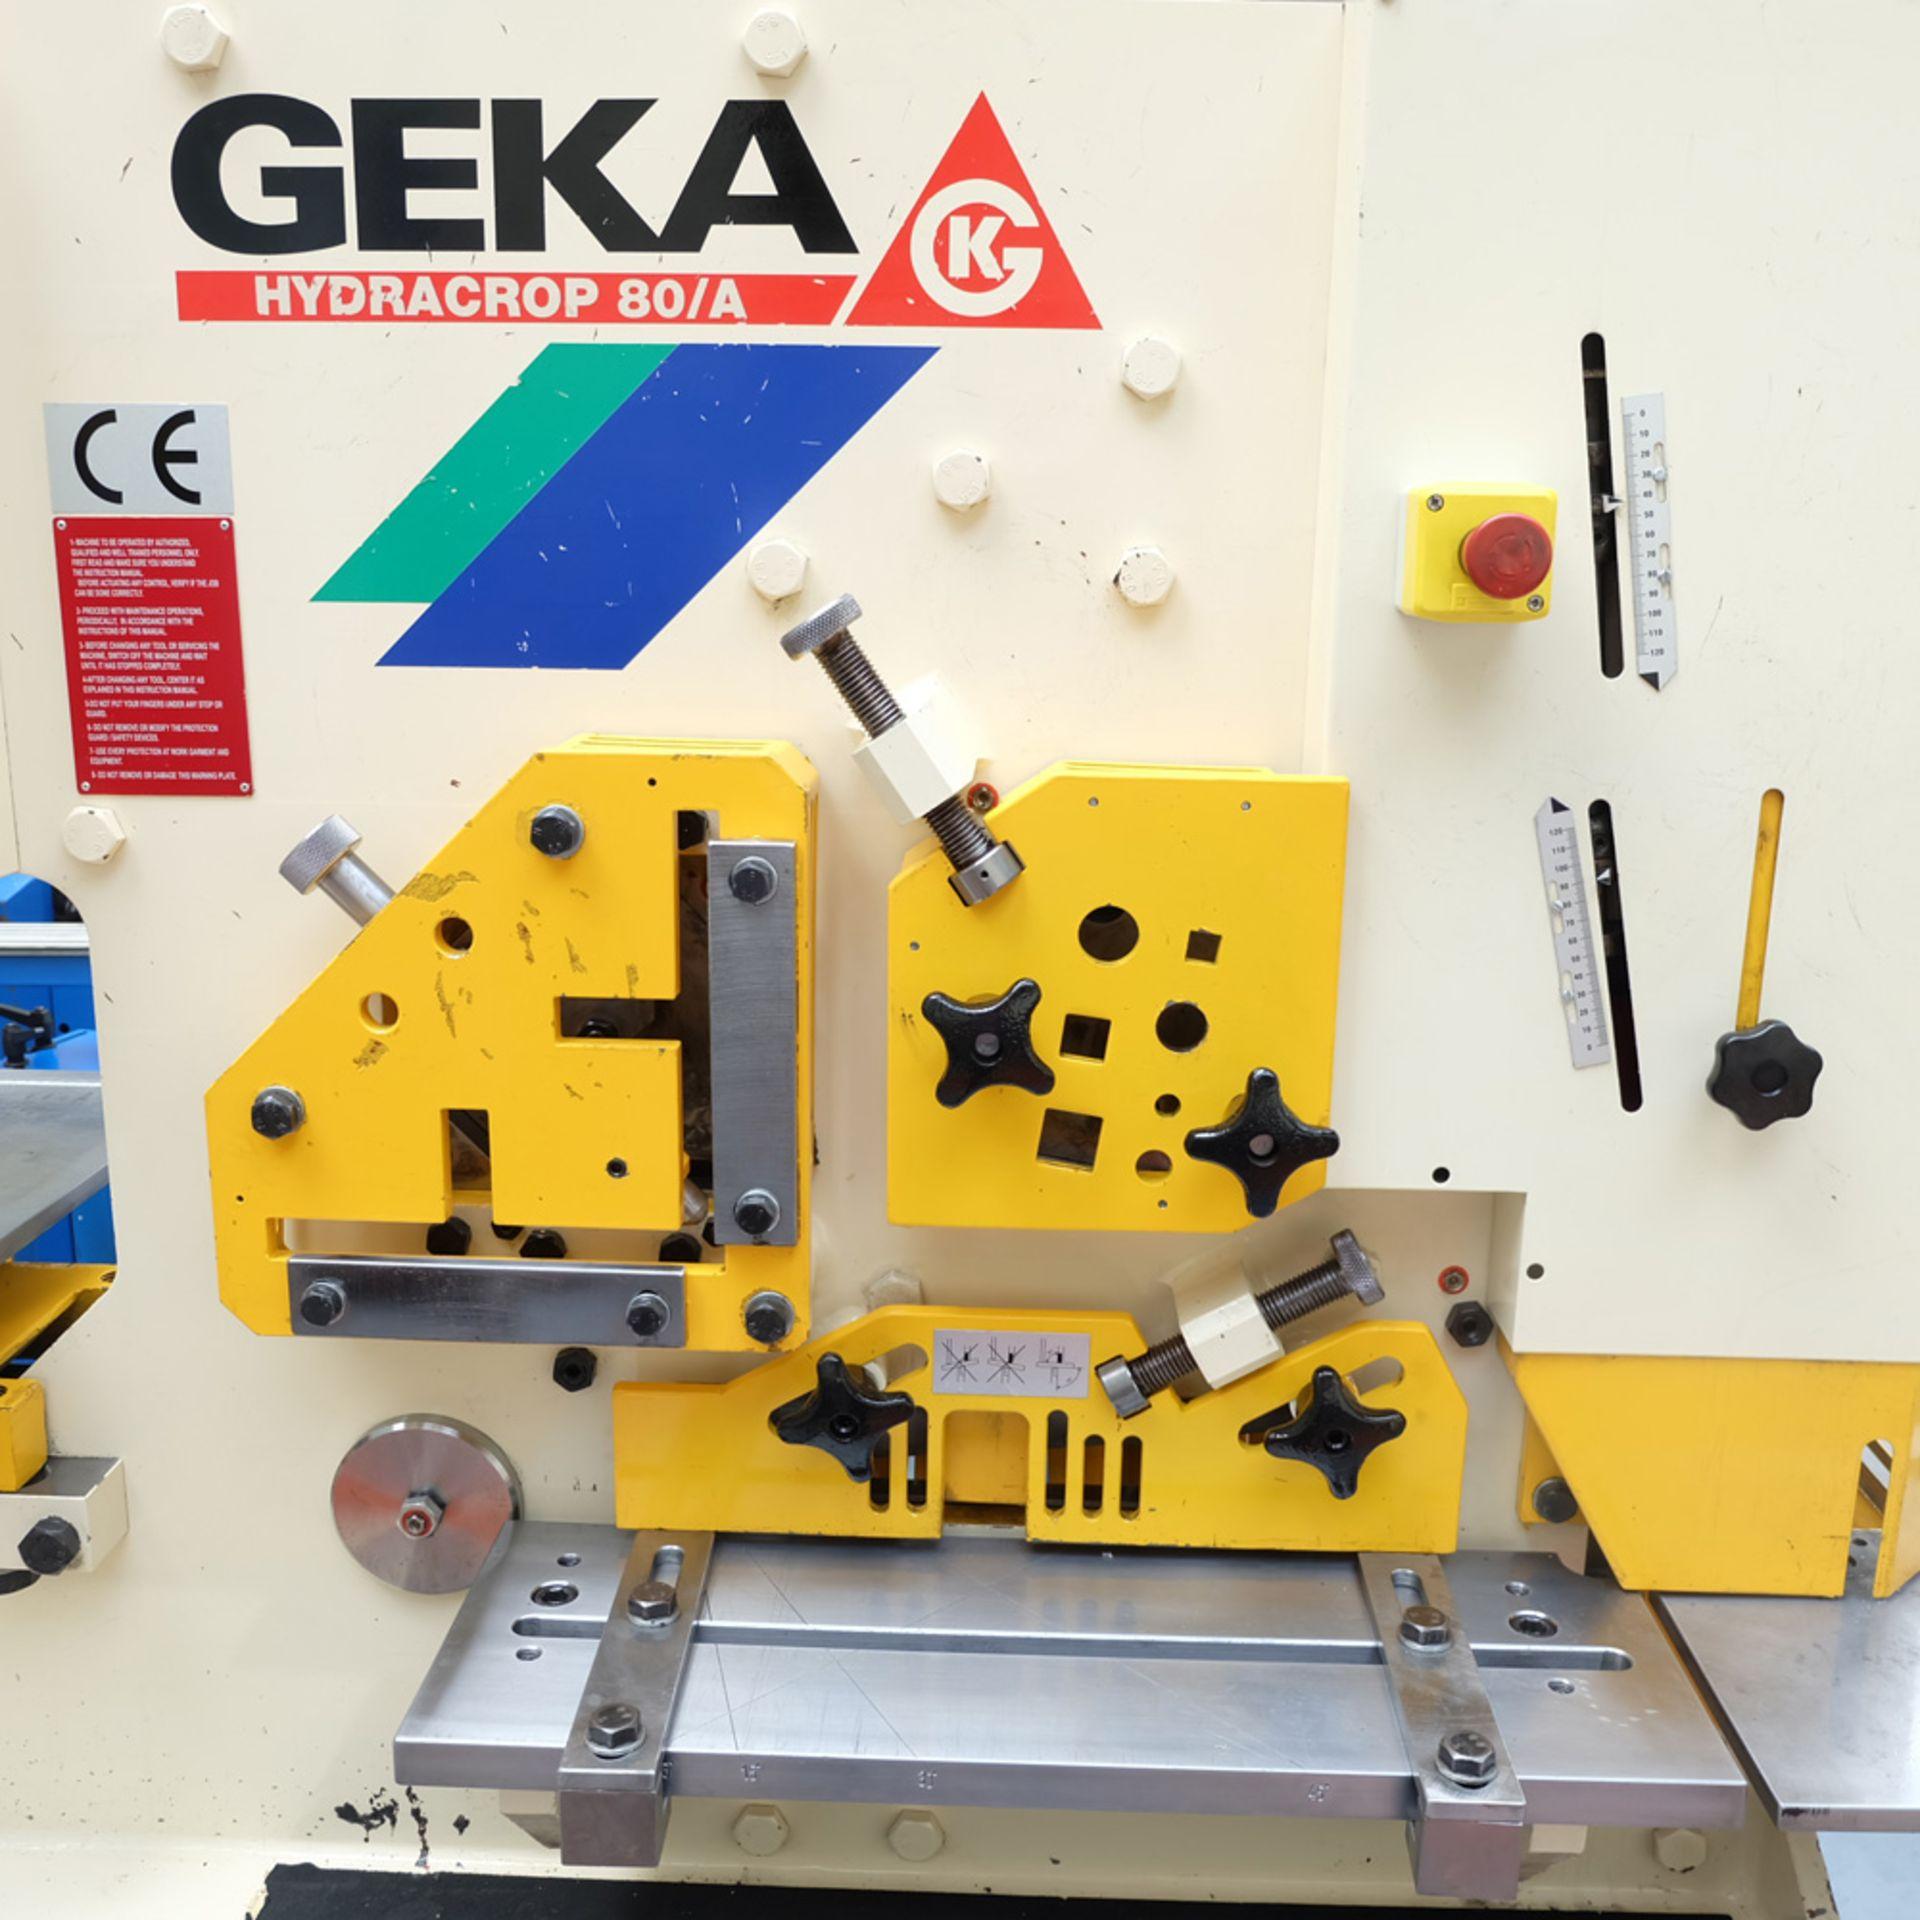 GEKA Model HYD 80/A Universal Steelworker - Image 4 of 21